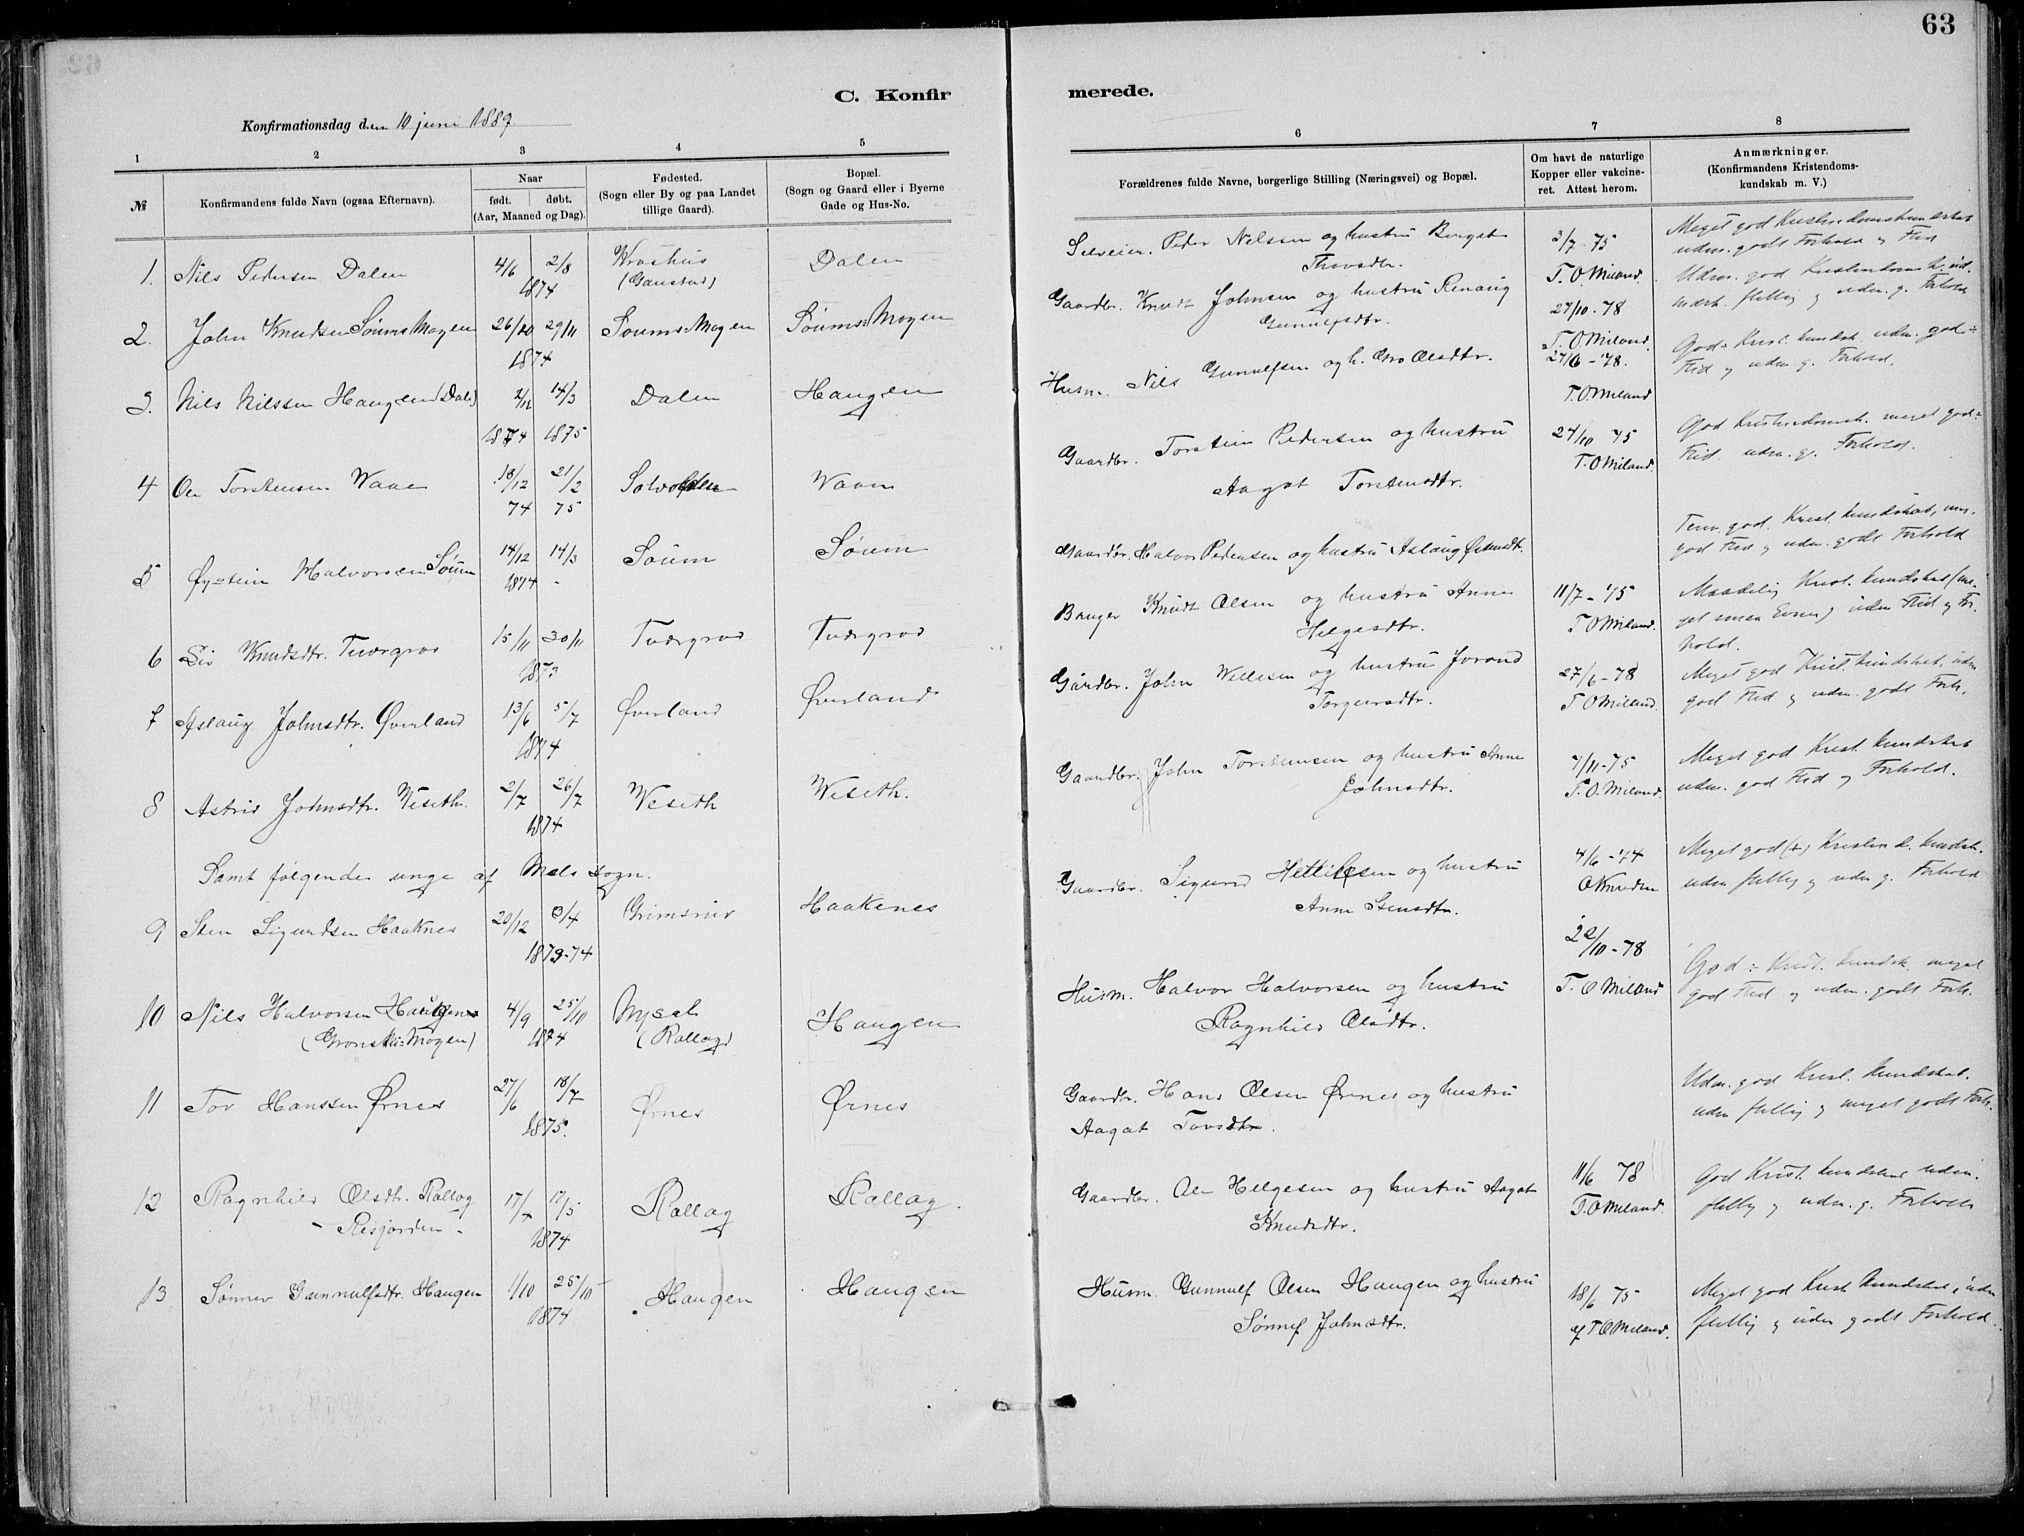 SAKO, Rjukan kirkebøker, F/Fa/L0001: Ministerialbok nr. 1, 1878-1912, s. 63